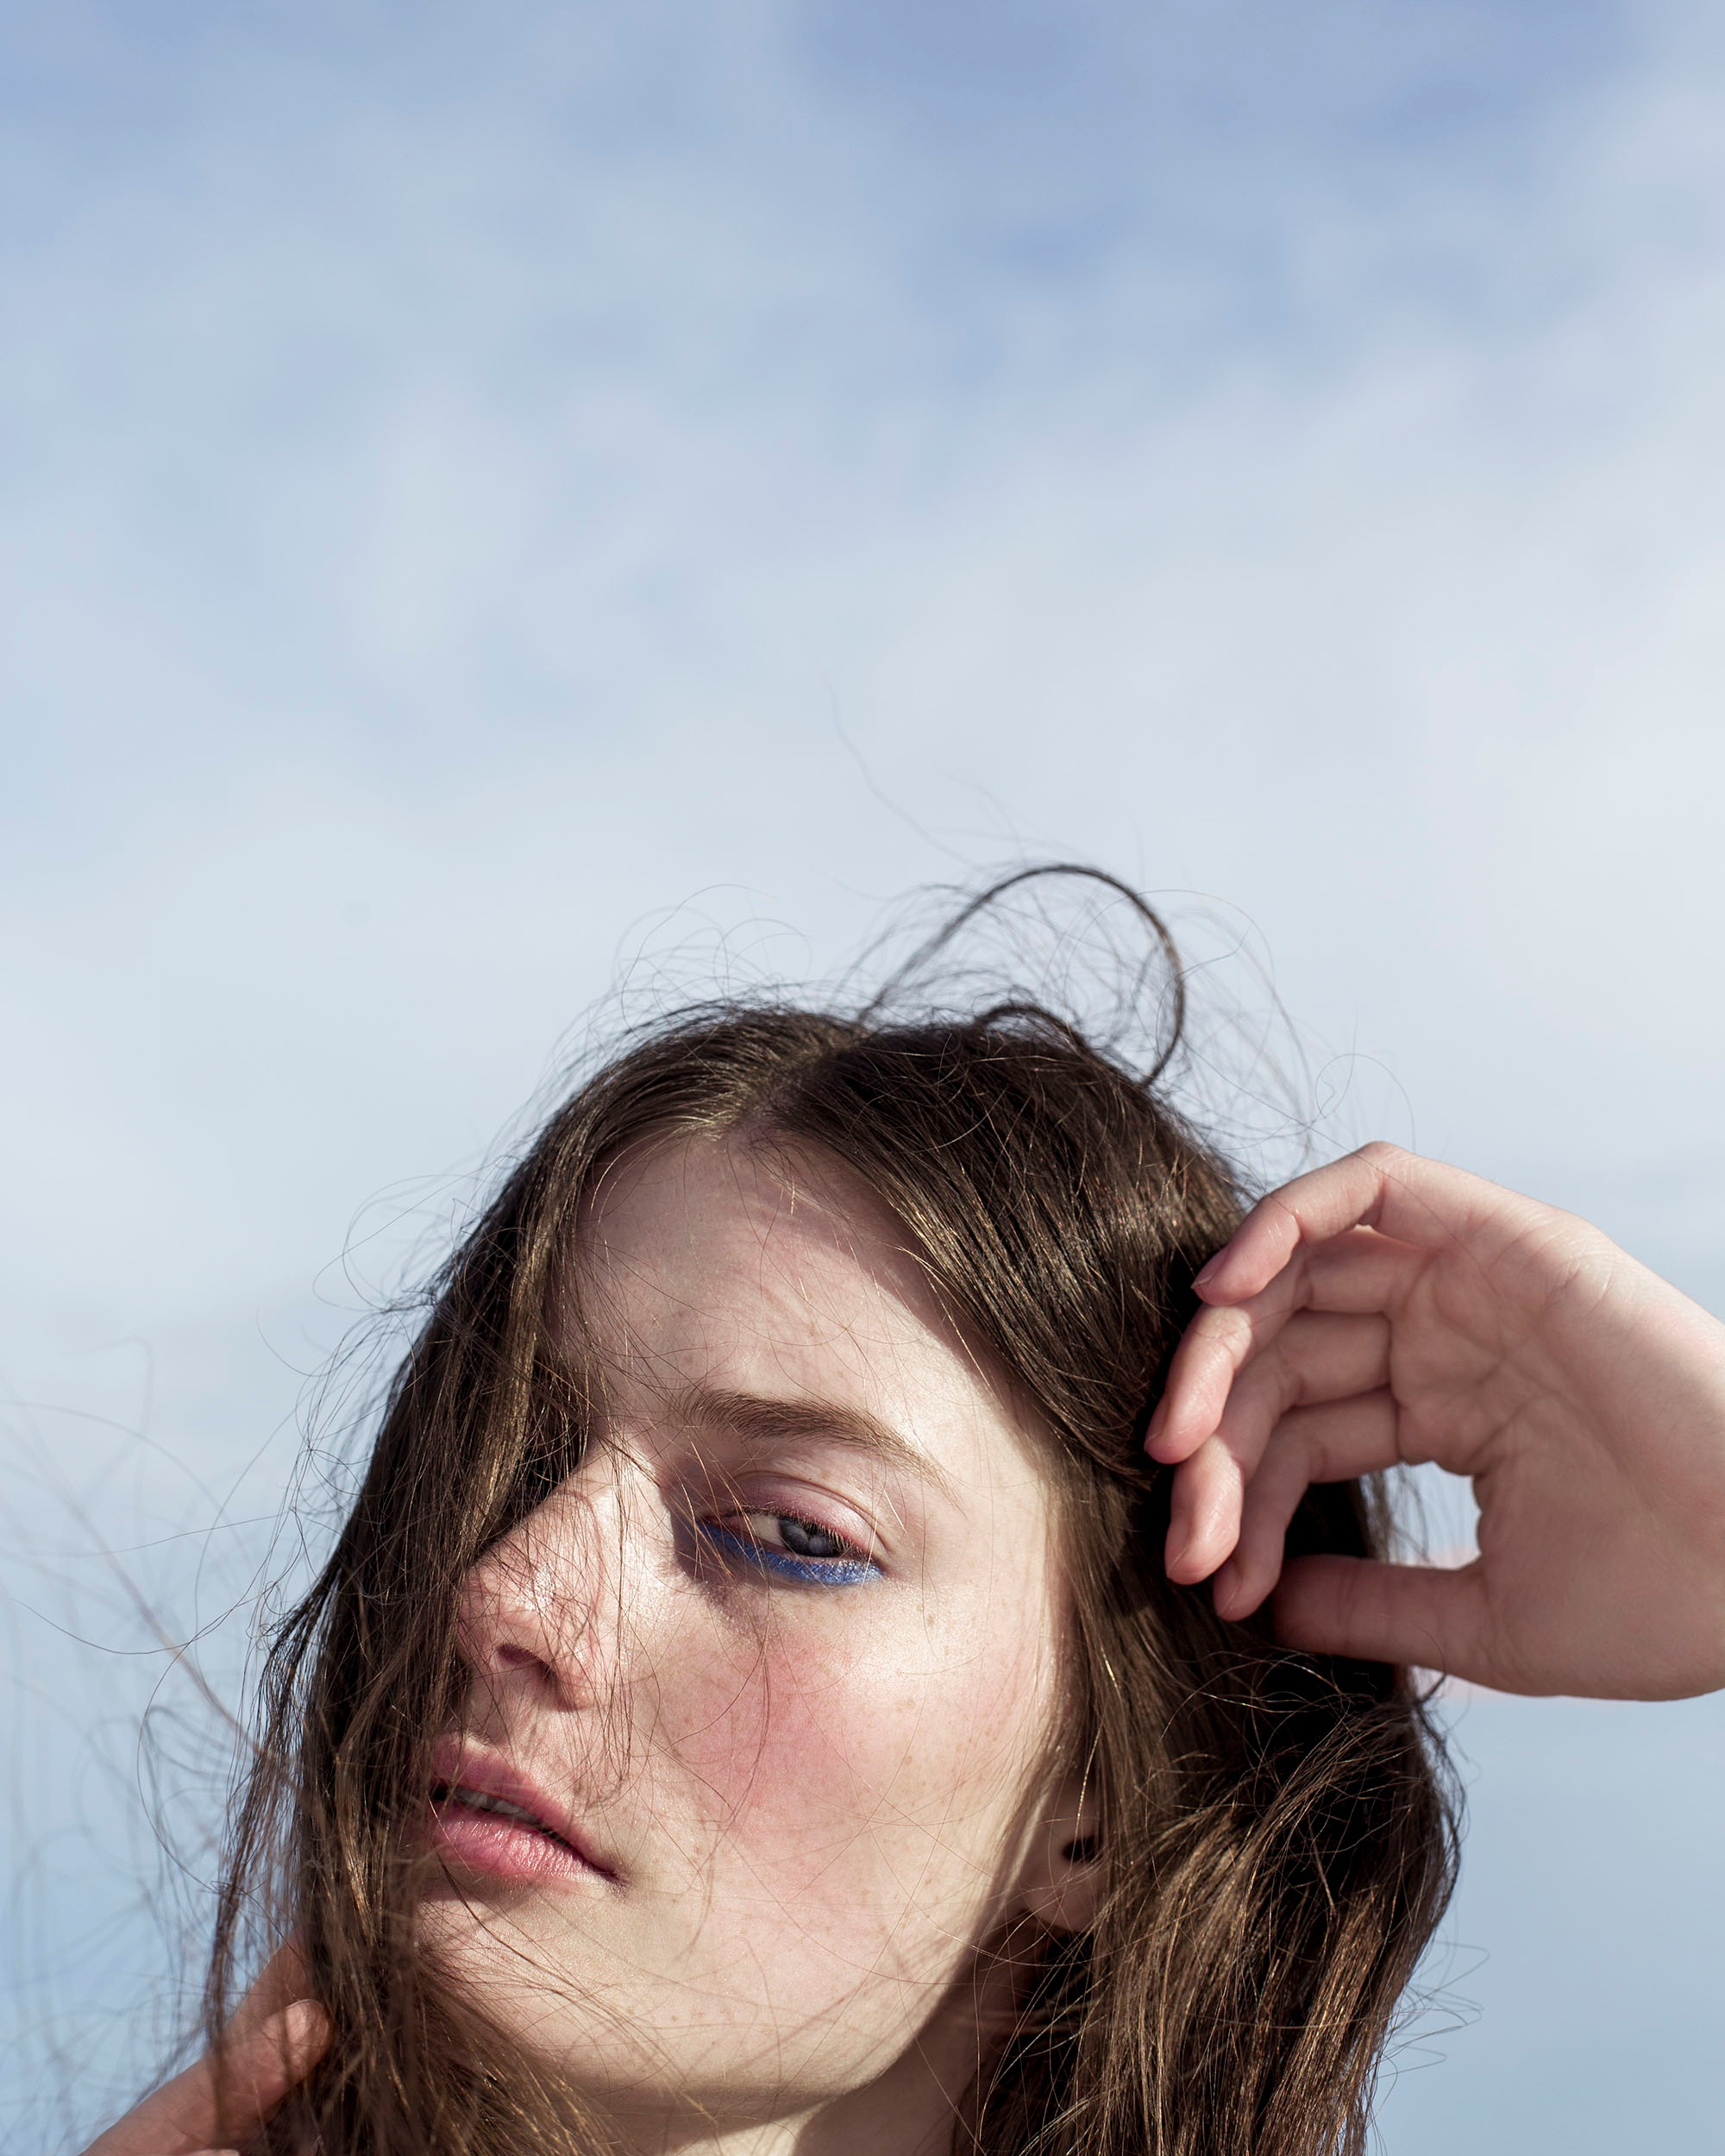 Fresh Air_Kristina Loewen_klein1.jpg